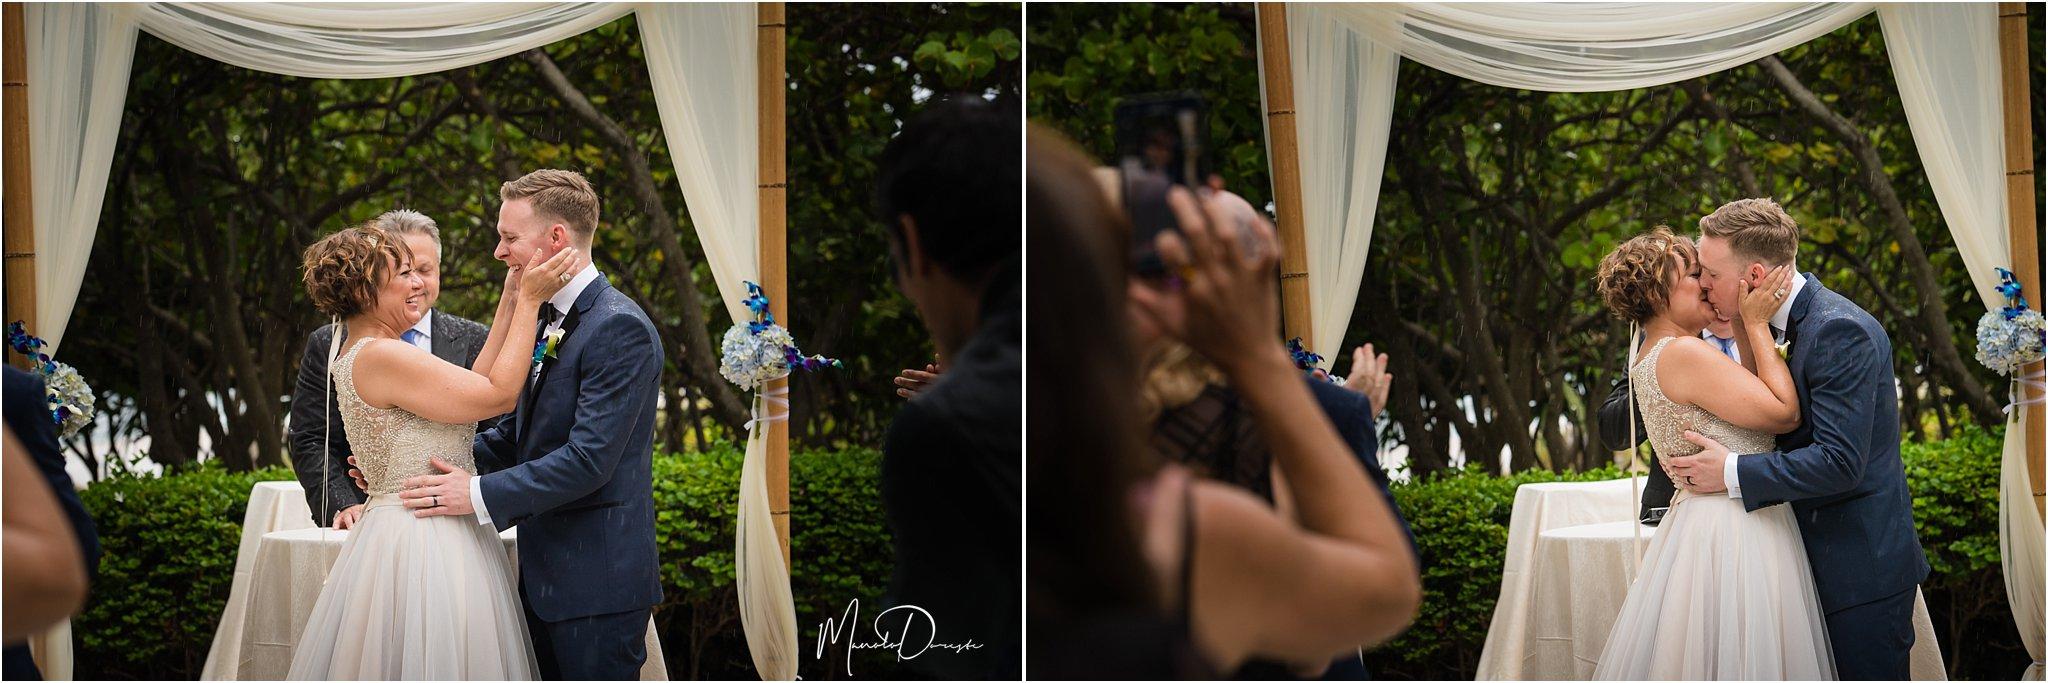 0453_ManoloDoreste_InFocusStudios_Wedding_Family_Photography_Miami_MiamiPhotographer.jpg